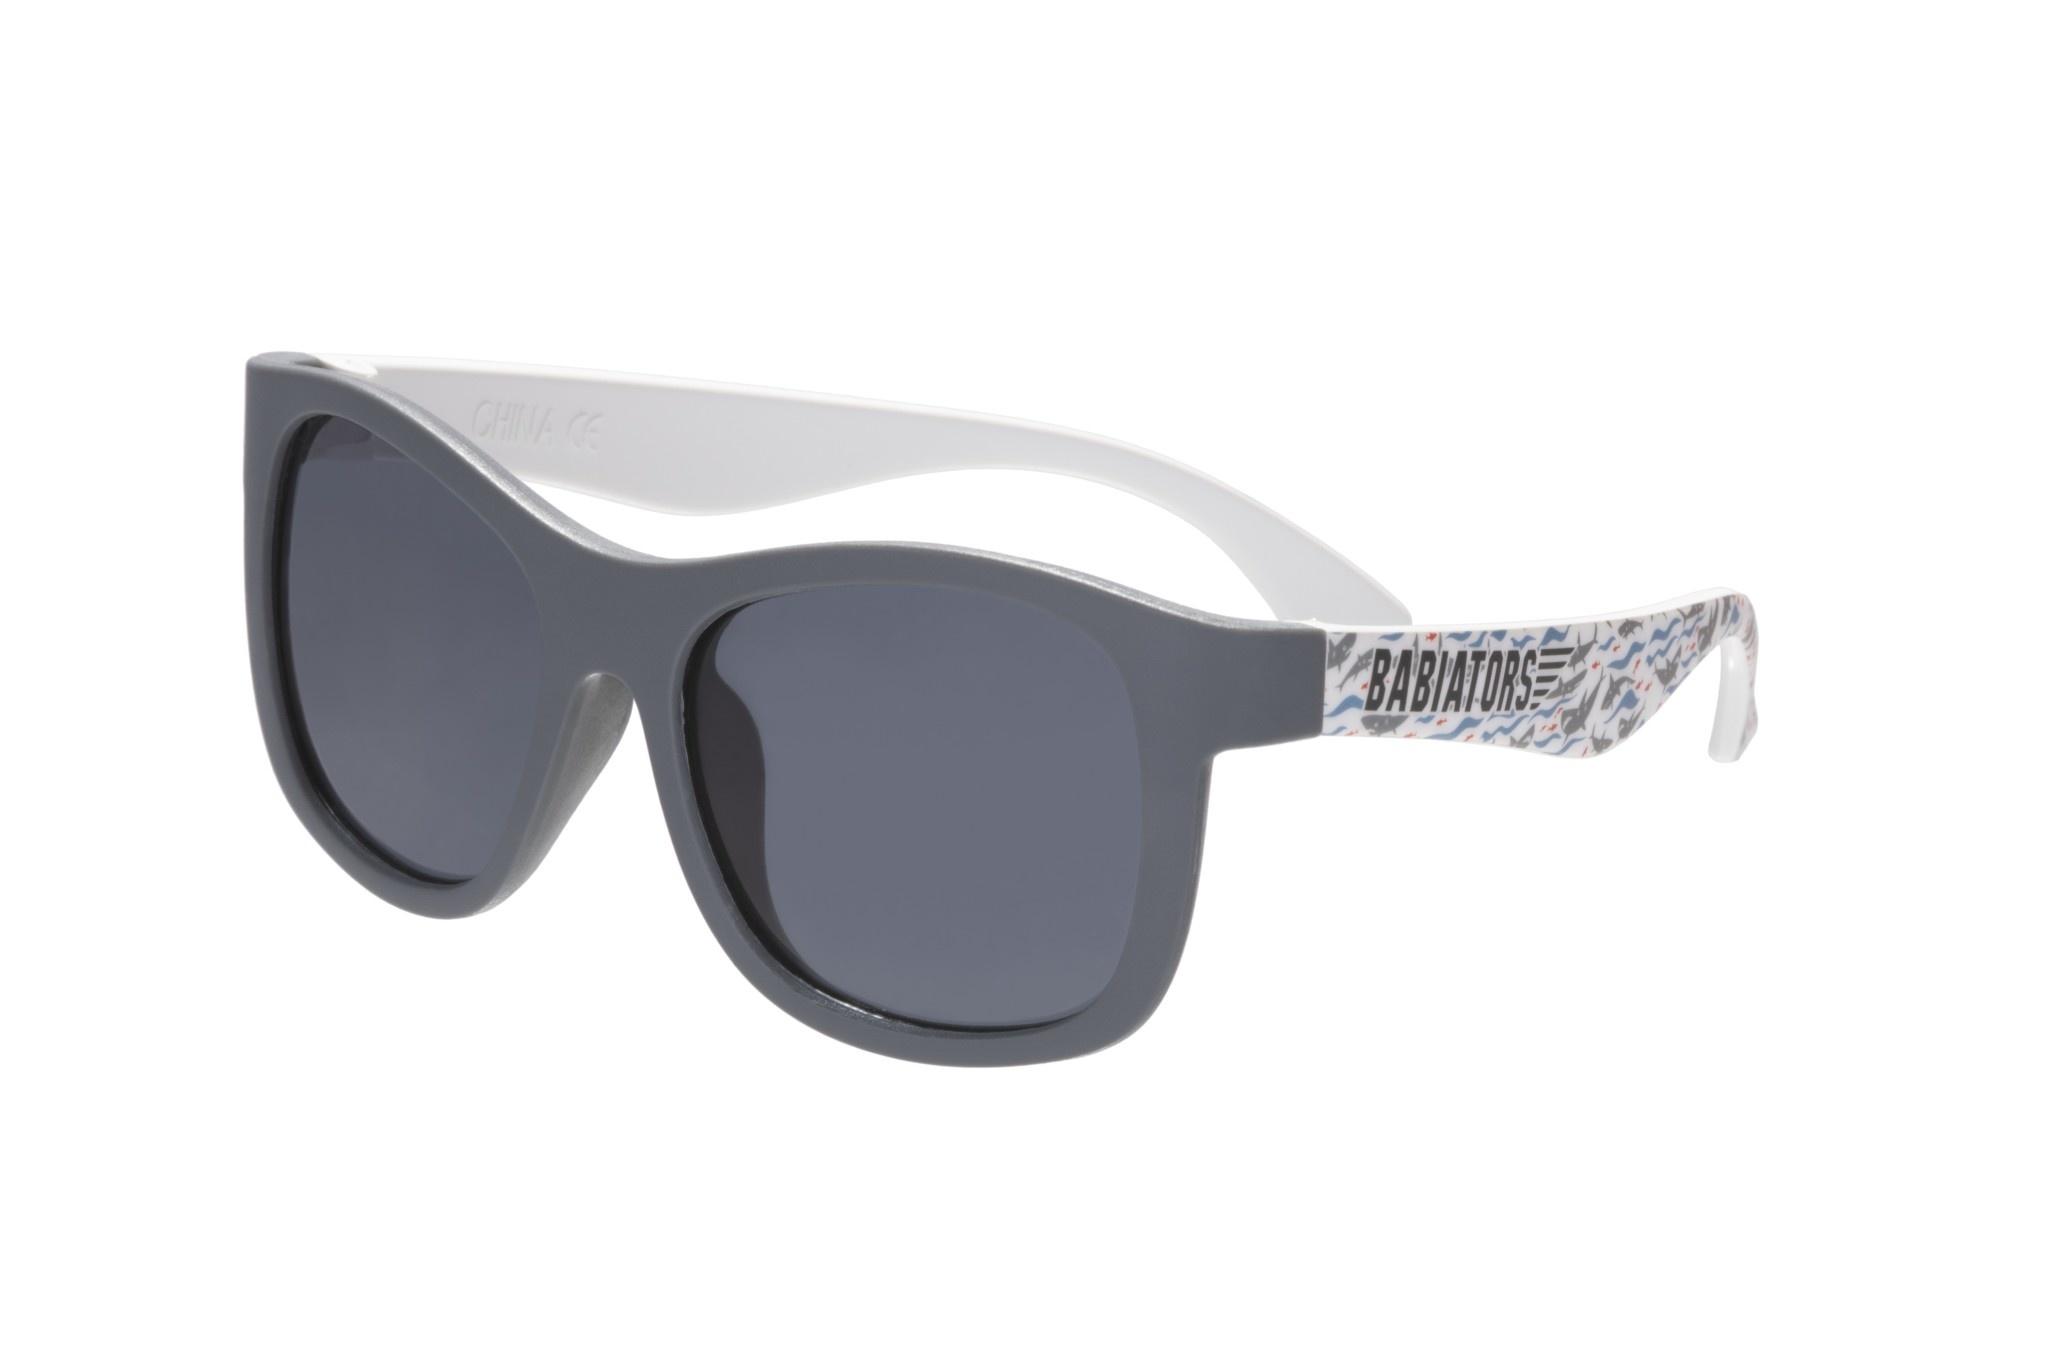 Limited Edition Navigator - Shark-Tastic Grey